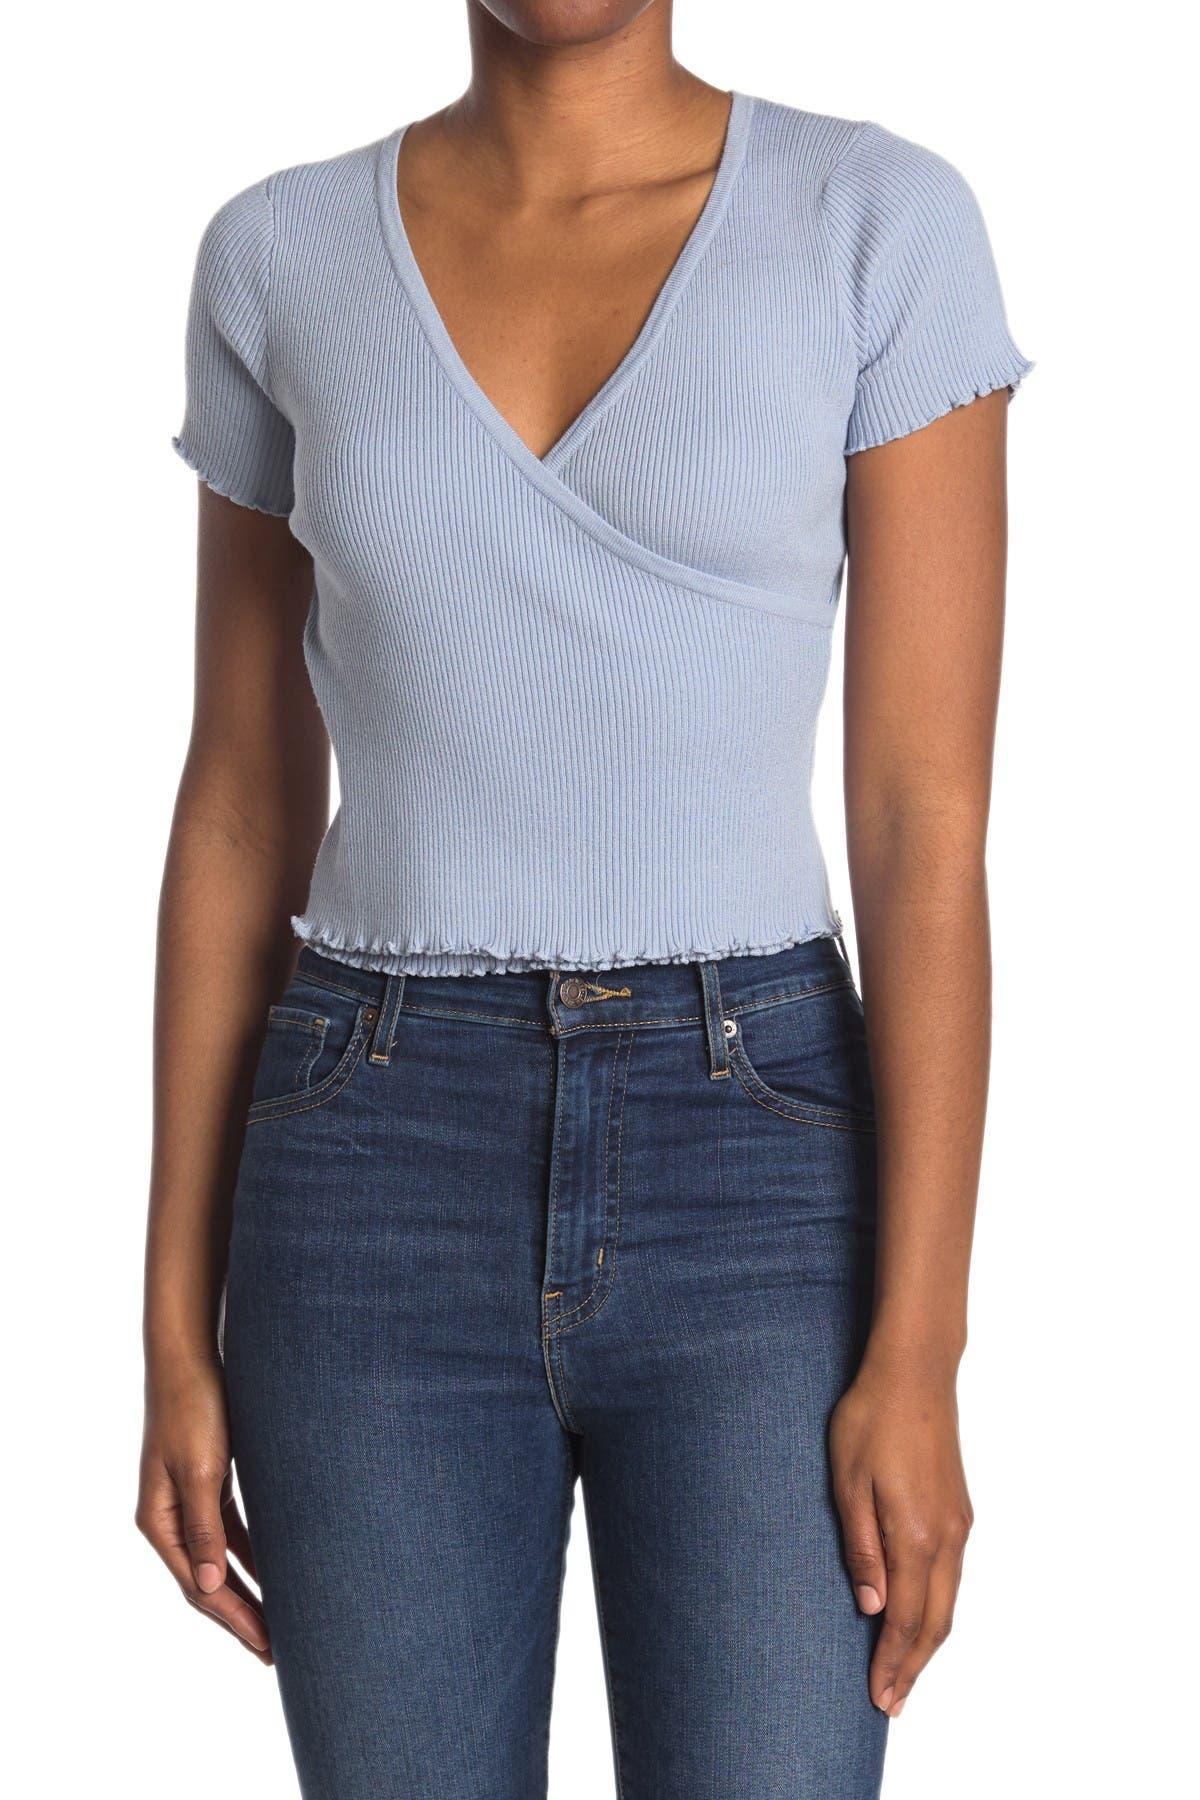 Image of Lush Surplice Short Sleeve Ribbed Crop Top